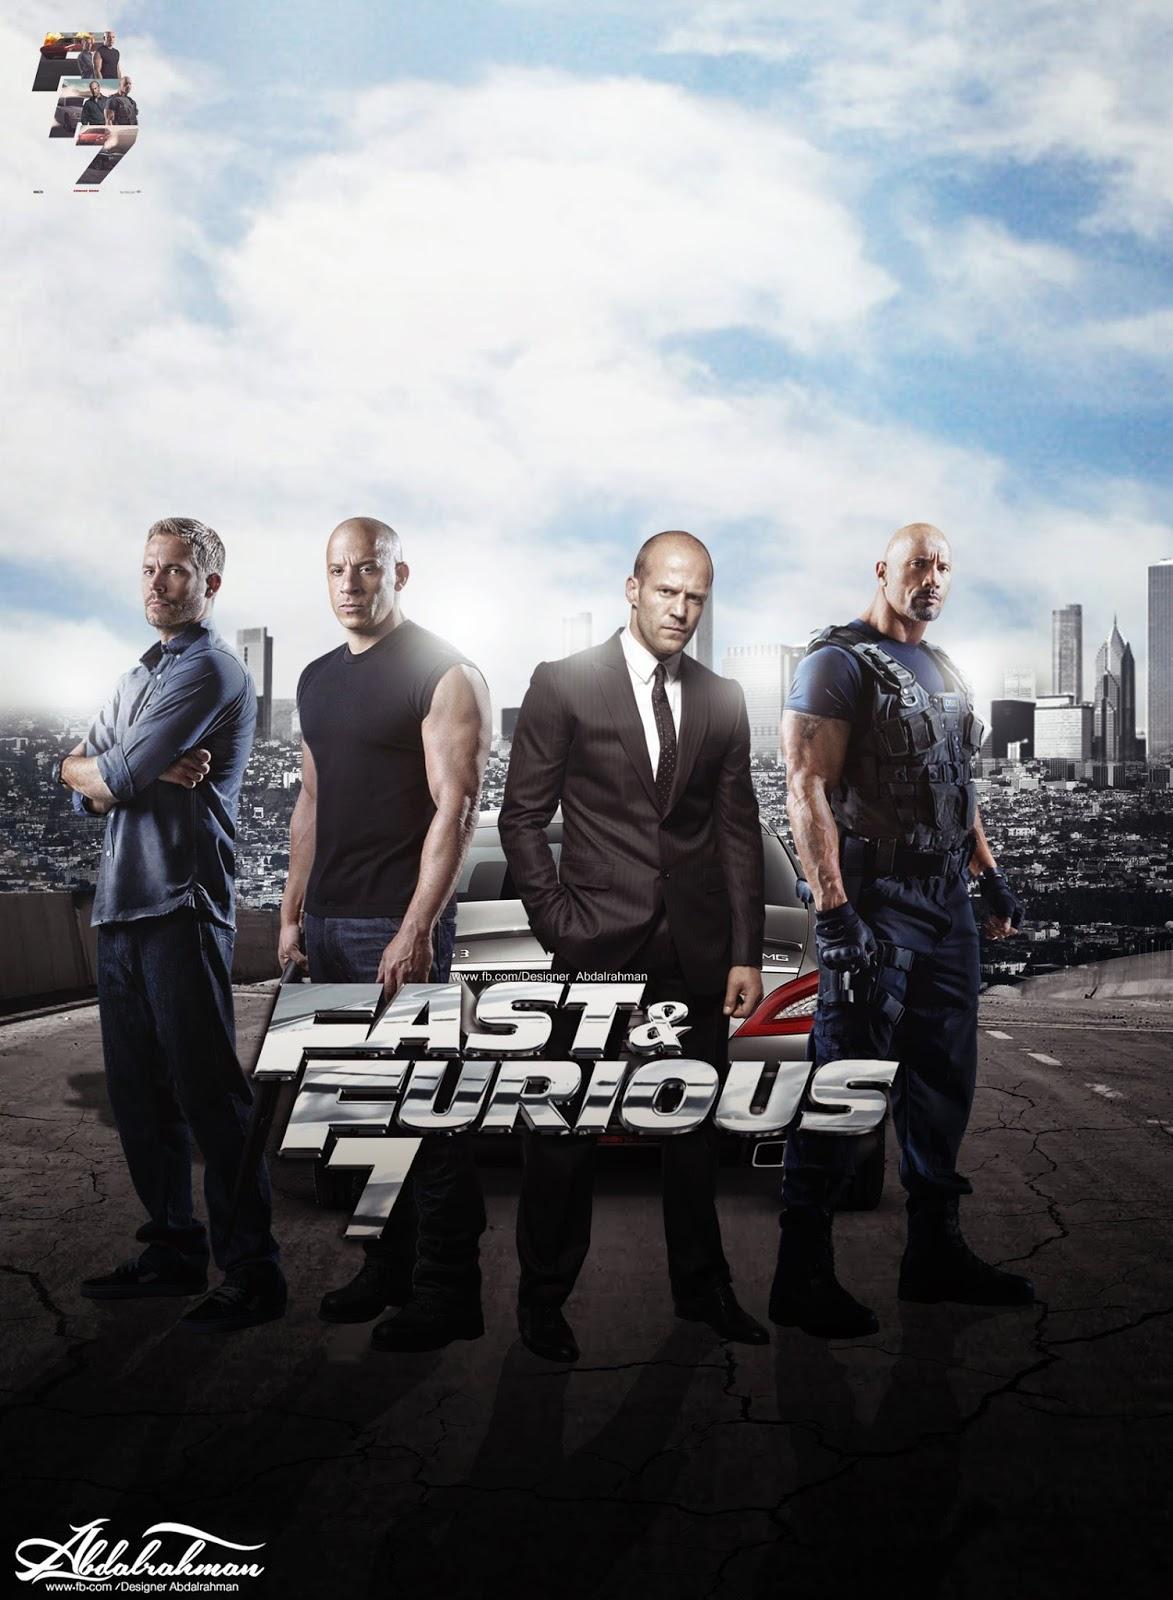 Fast Furious 7 Sub Indo : furious, Dloadzure, Tempatnya, Download, Software:, Furious, HDRip, 900MB, Subtitle, Indonesia